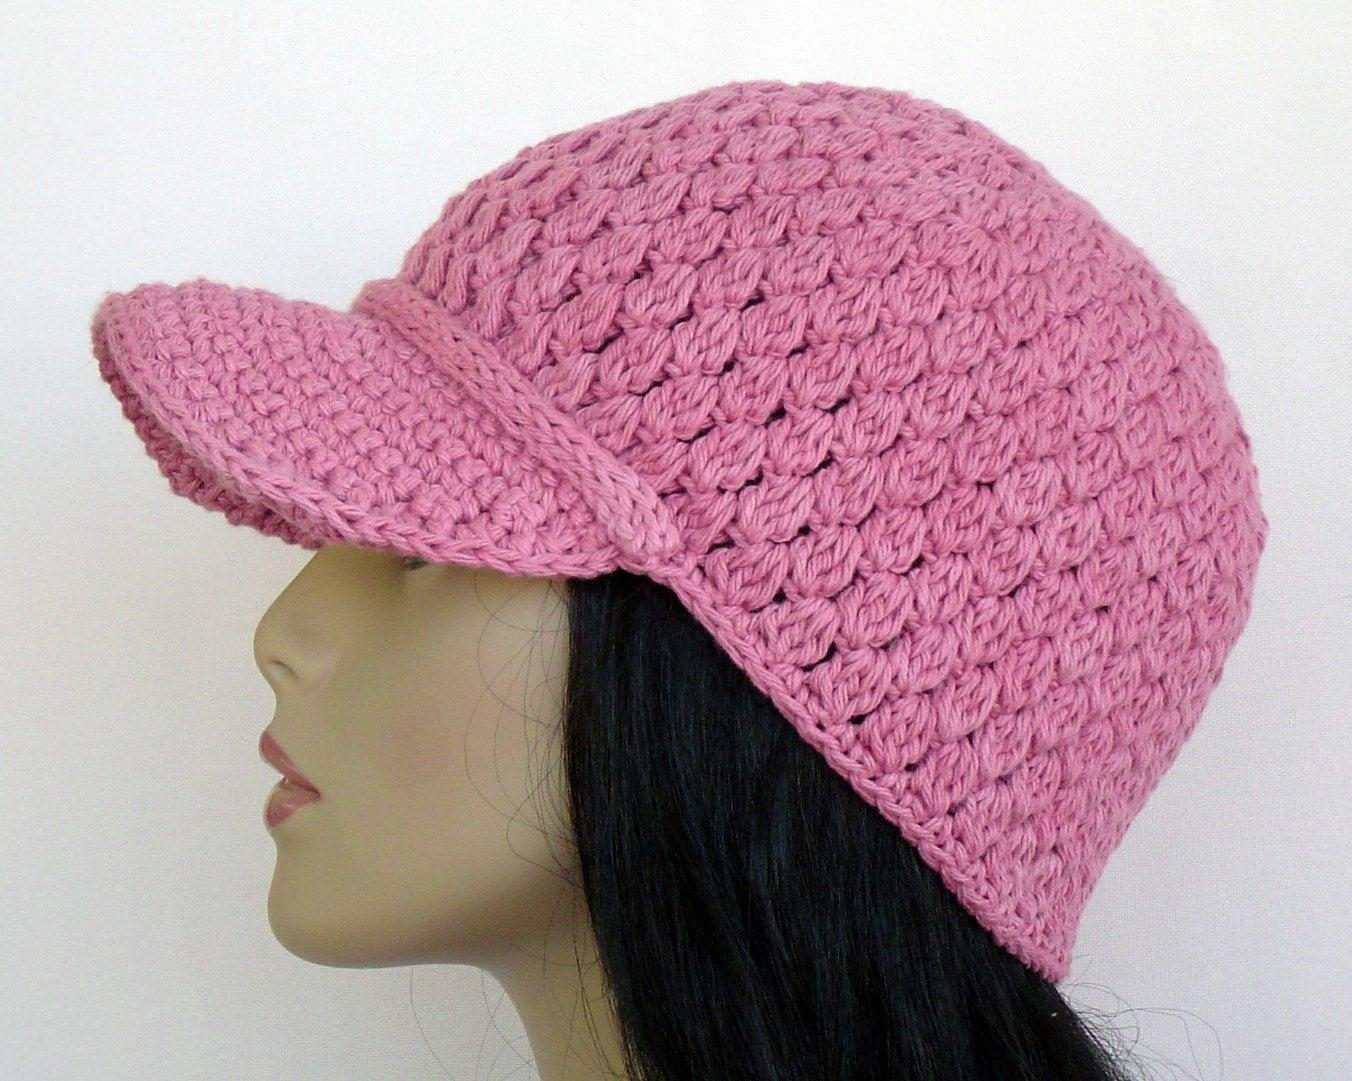 50 crochet baseball cap cotton in mauve clearance